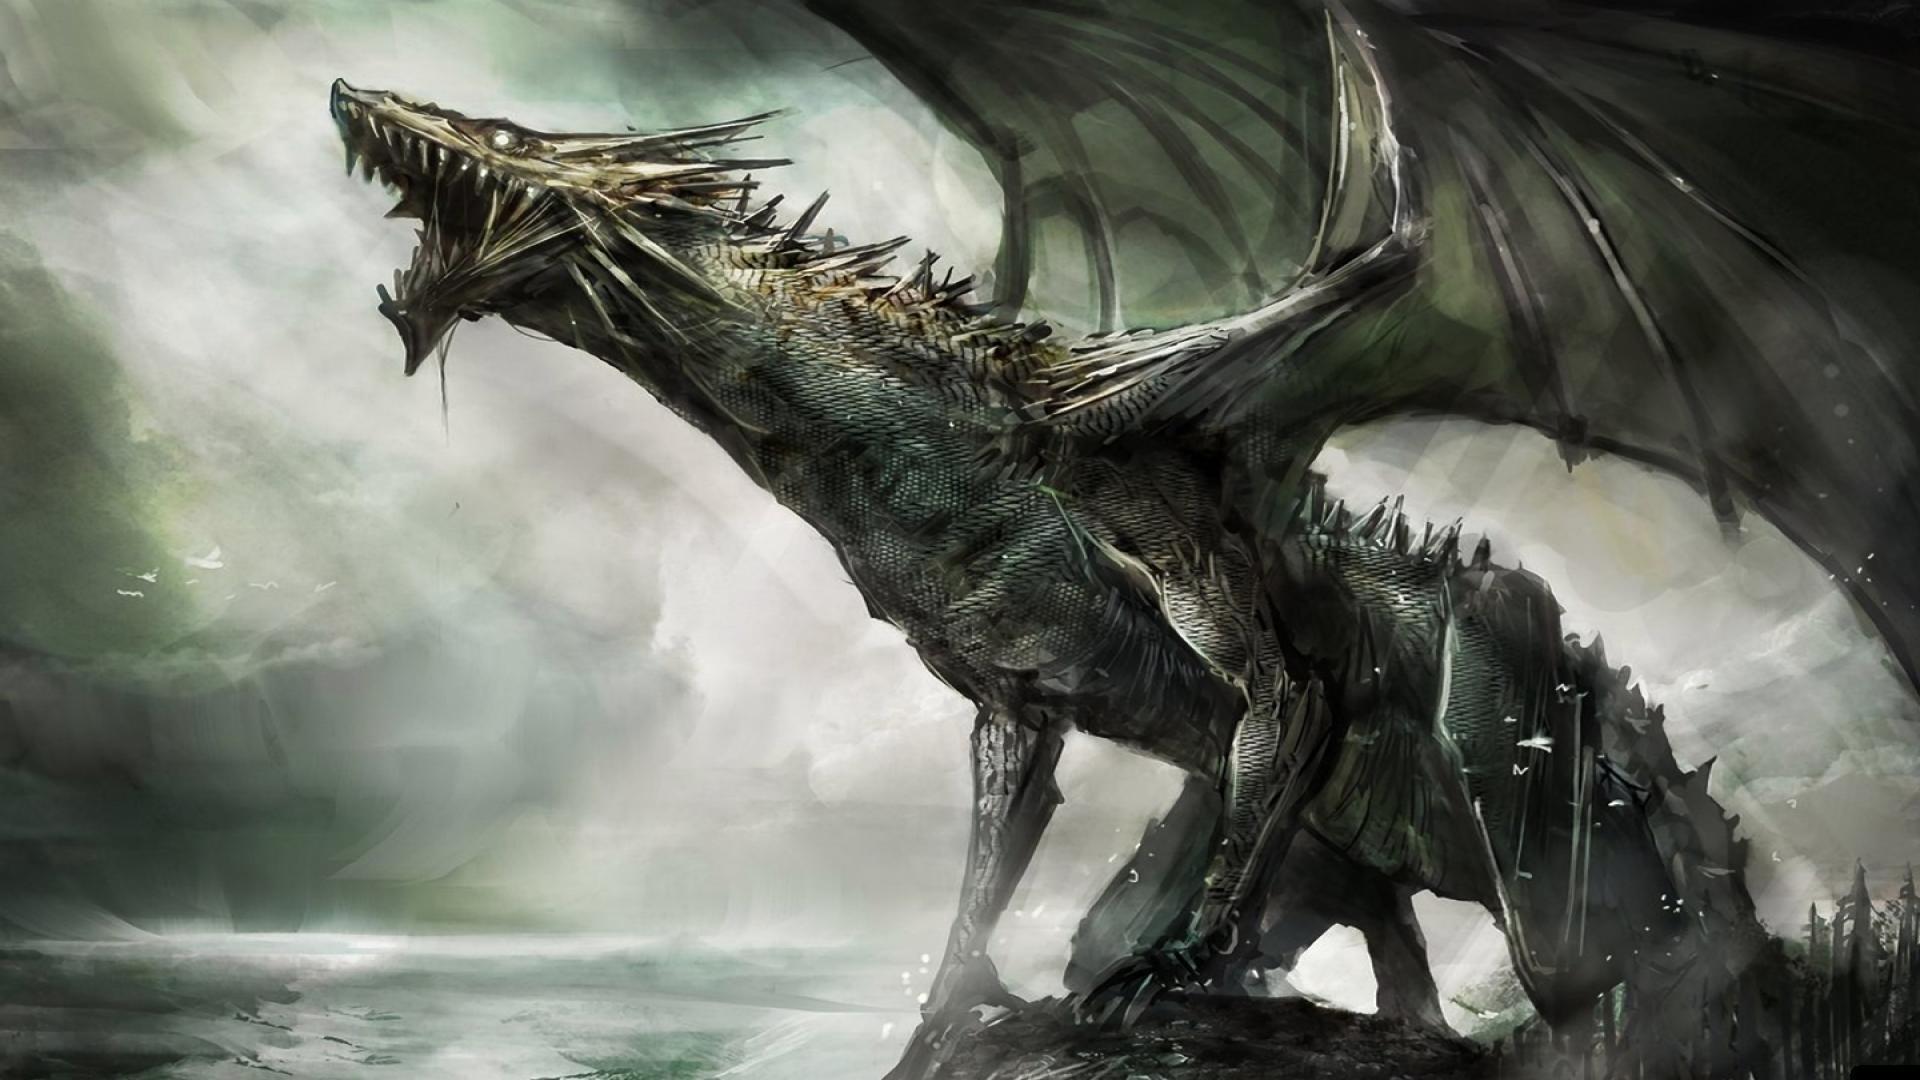 Paintings Dragons Wallpaper 1920x1080 Paintings Dragons Fantasy Art 1920x1080